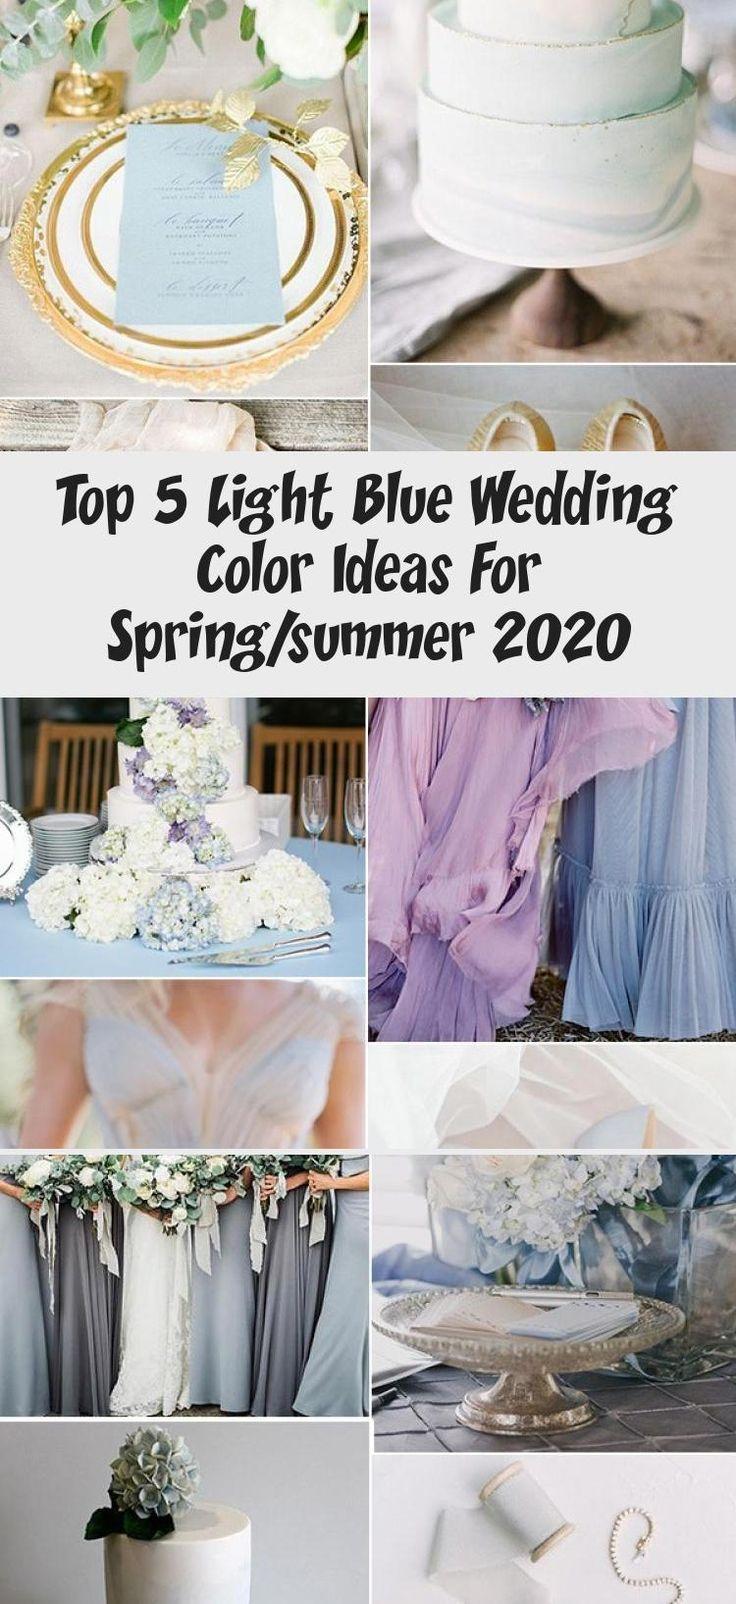 trending light blue and greenery wedding color ideas for spring summer 2019 #weddingcolors #weddingideas #blueweddings #Englishgardenwedding #gardenweddingInvitations #gardenweddingTableDecor #Homegardenwedding #gardenweddingLights